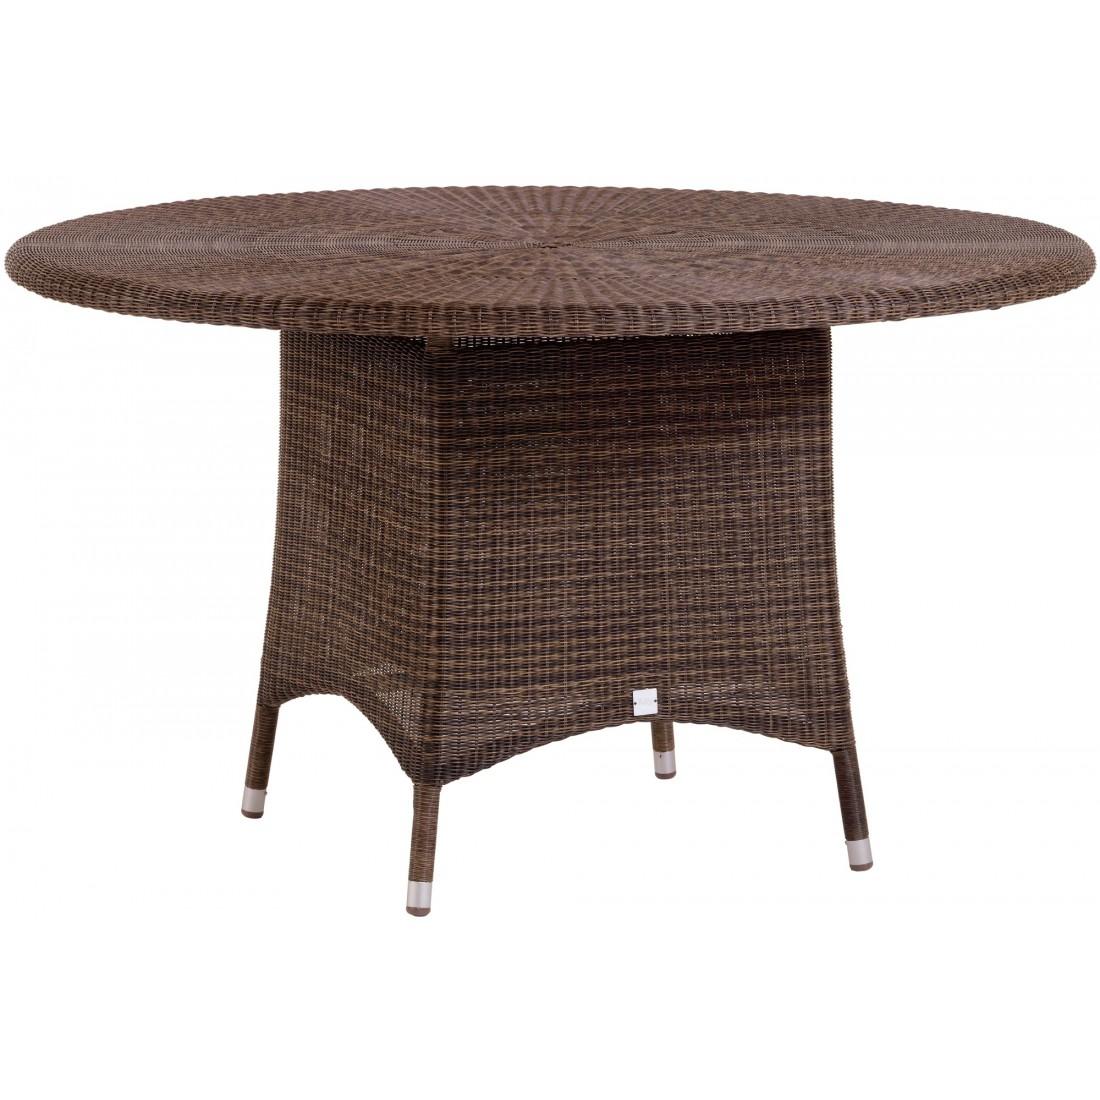 table de jardin en r sine poivre ronde cigale diam tre 130 cm. Black Bedroom Furniture Sets. Home Design Ideas